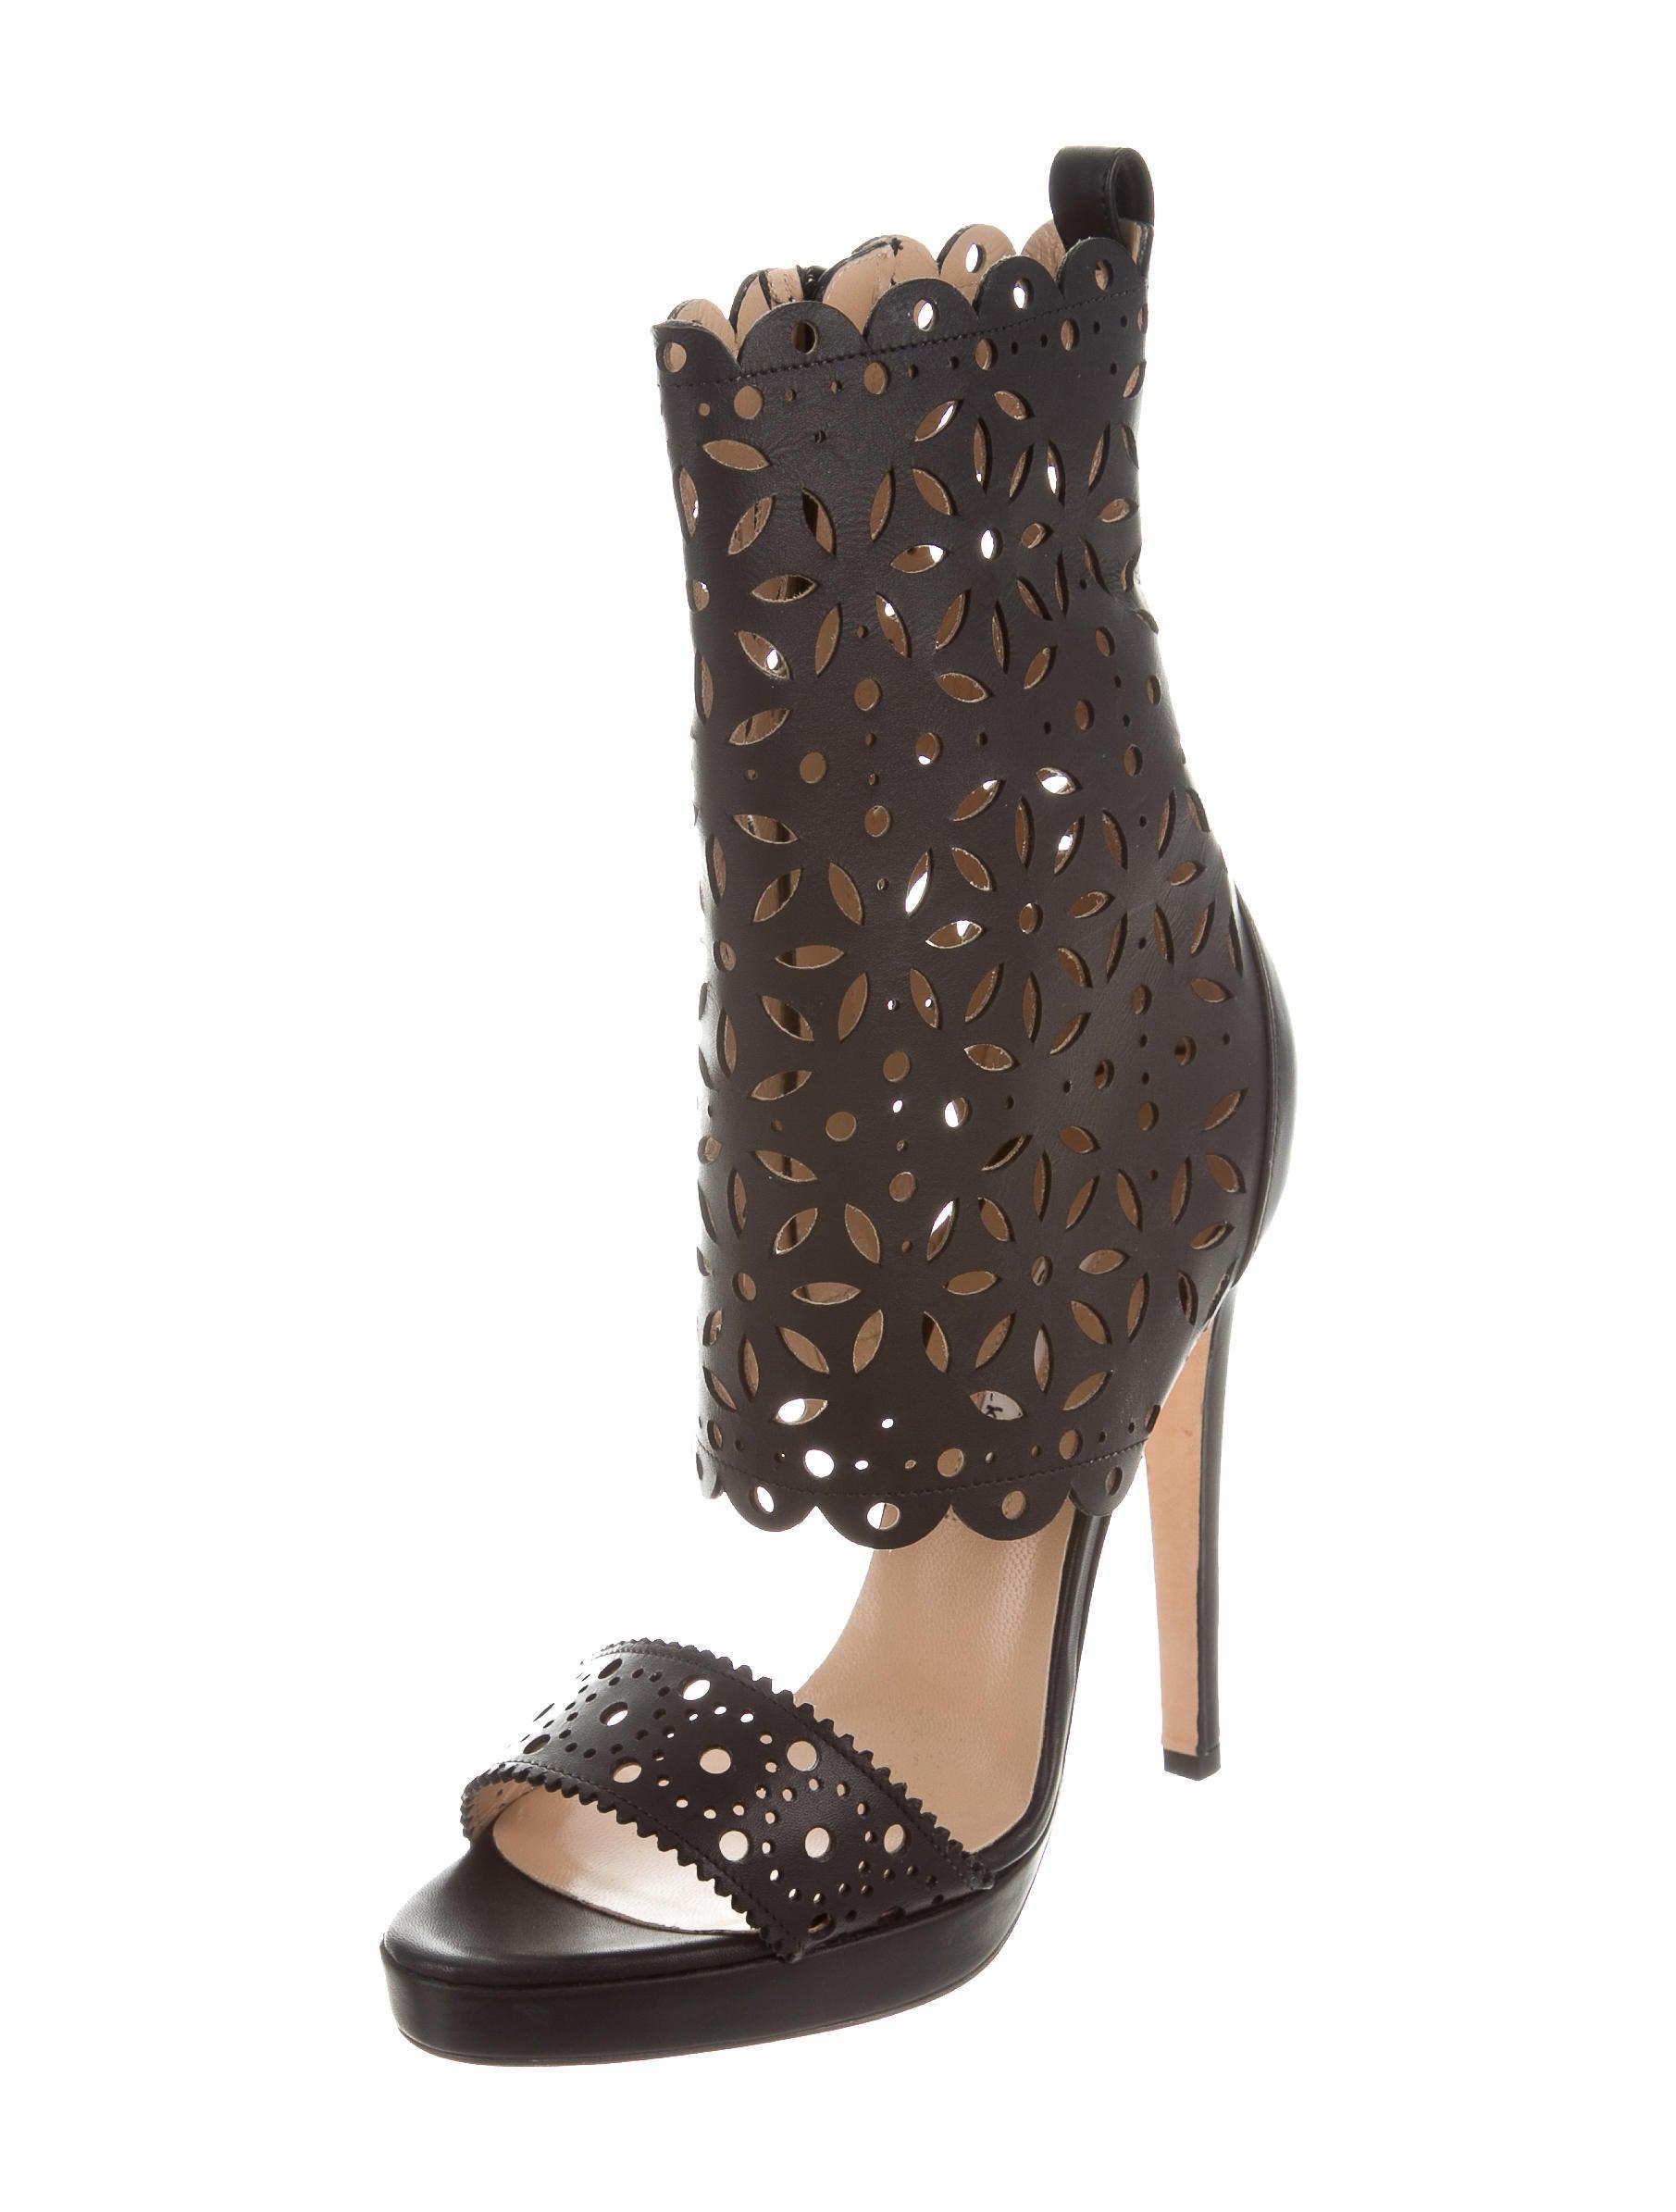 Oscar de la renta leather laser cut sandals shoes for Oscar de la renta candles